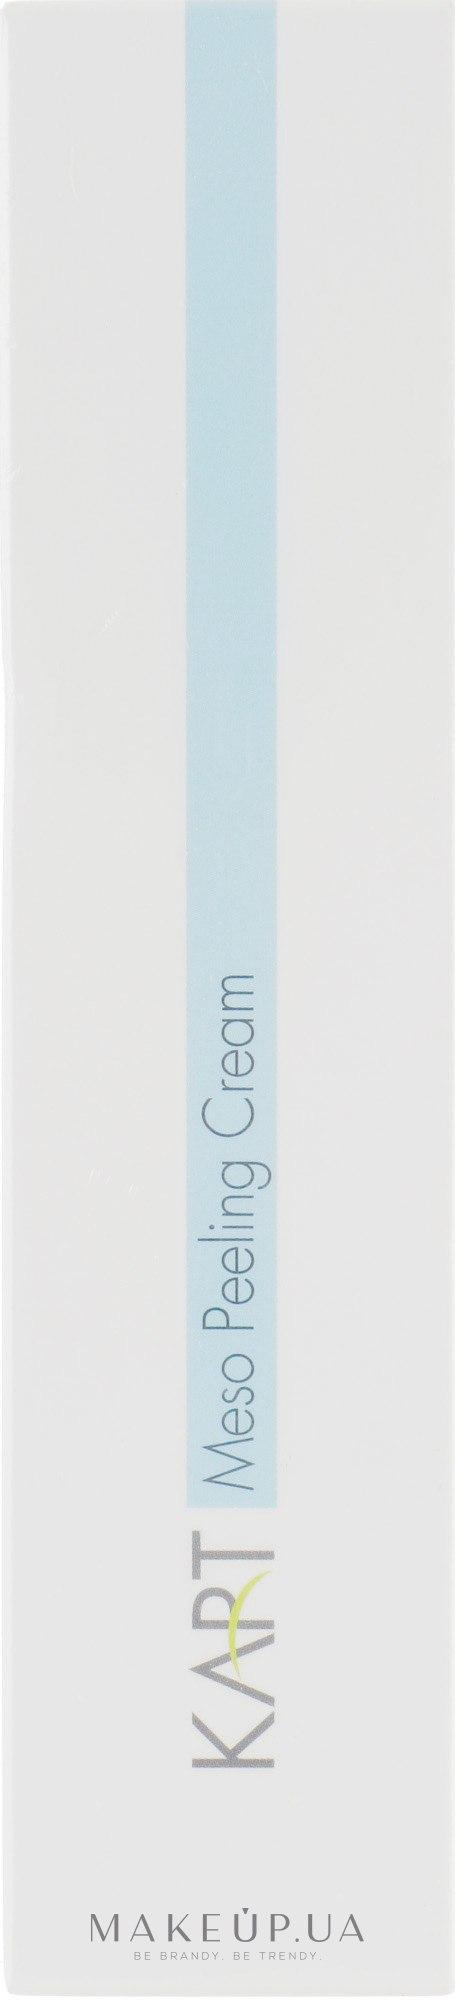 Мезо крем-пілінг - Kart Innovation Meso Peeling Cream — фото 100ml